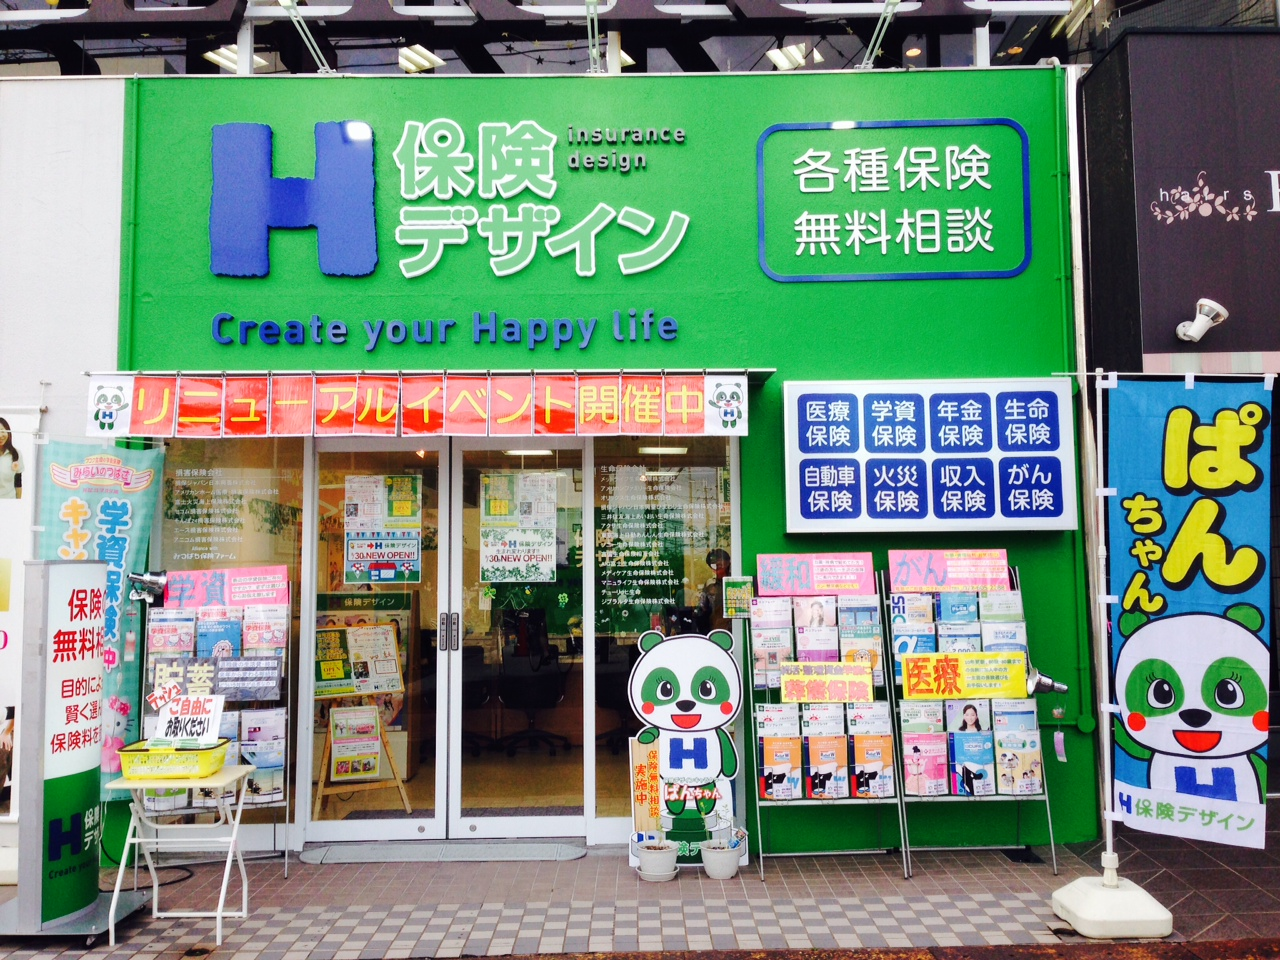 大阪府茨木市双葉町:保険デザイン茨木店